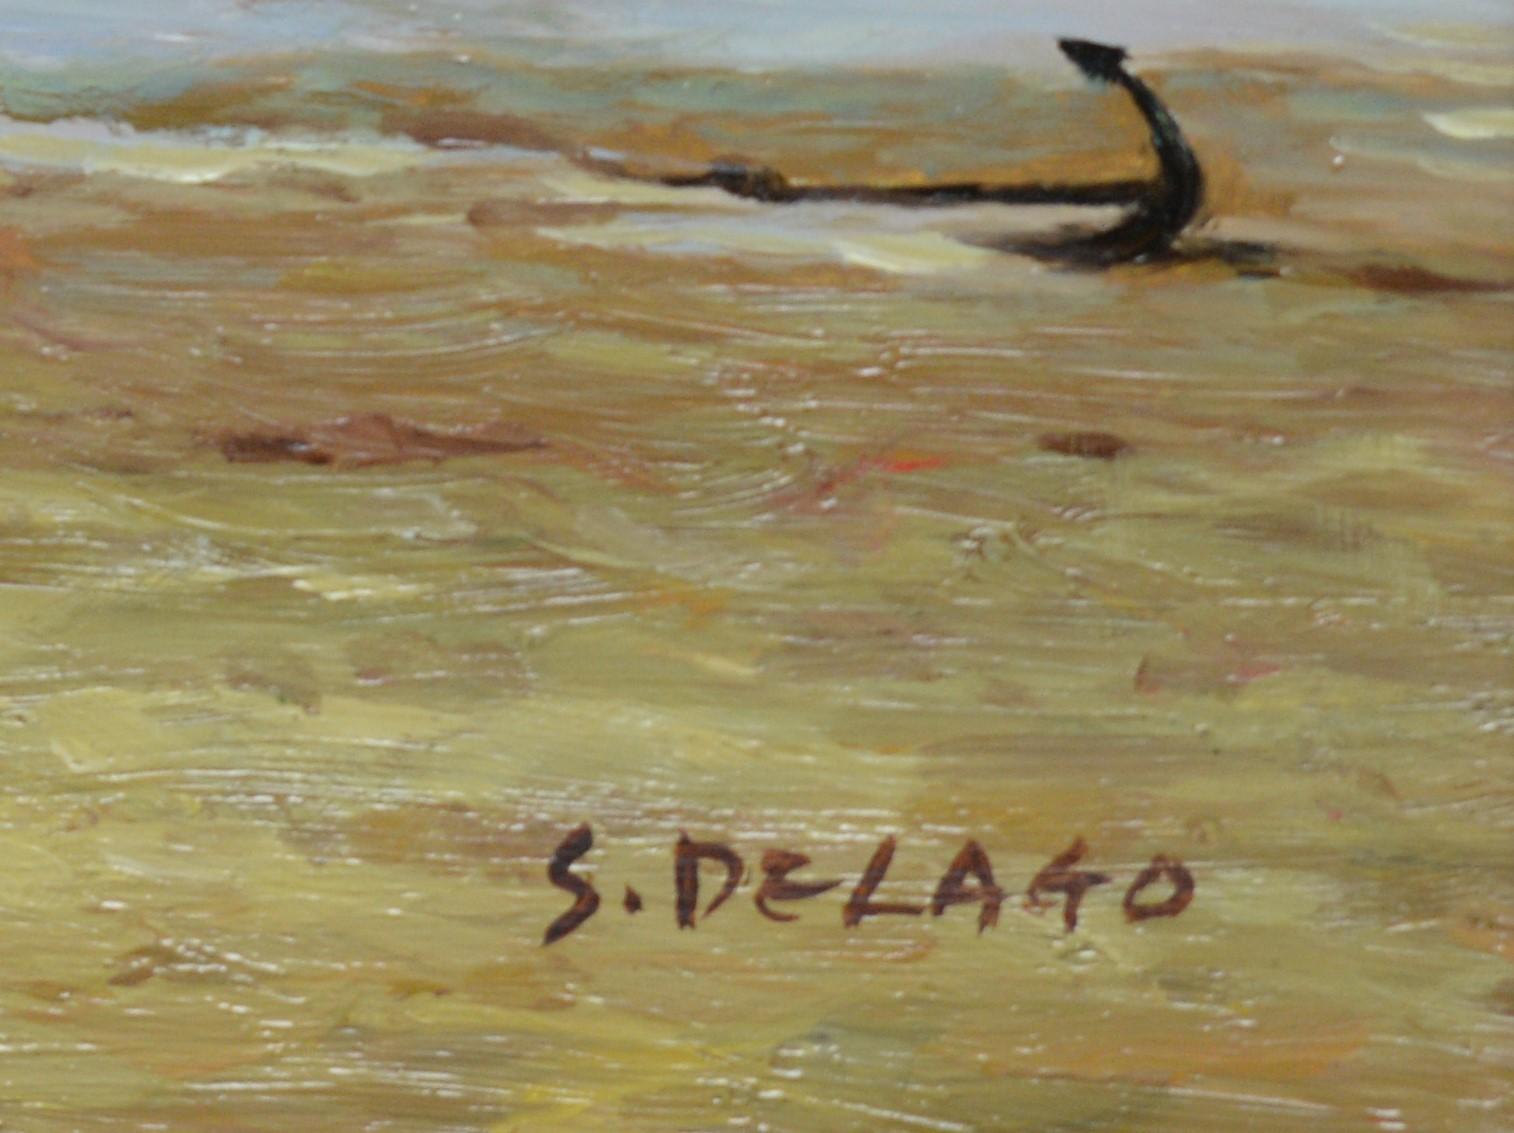 S* Delago - oil. - Image 2 of 3